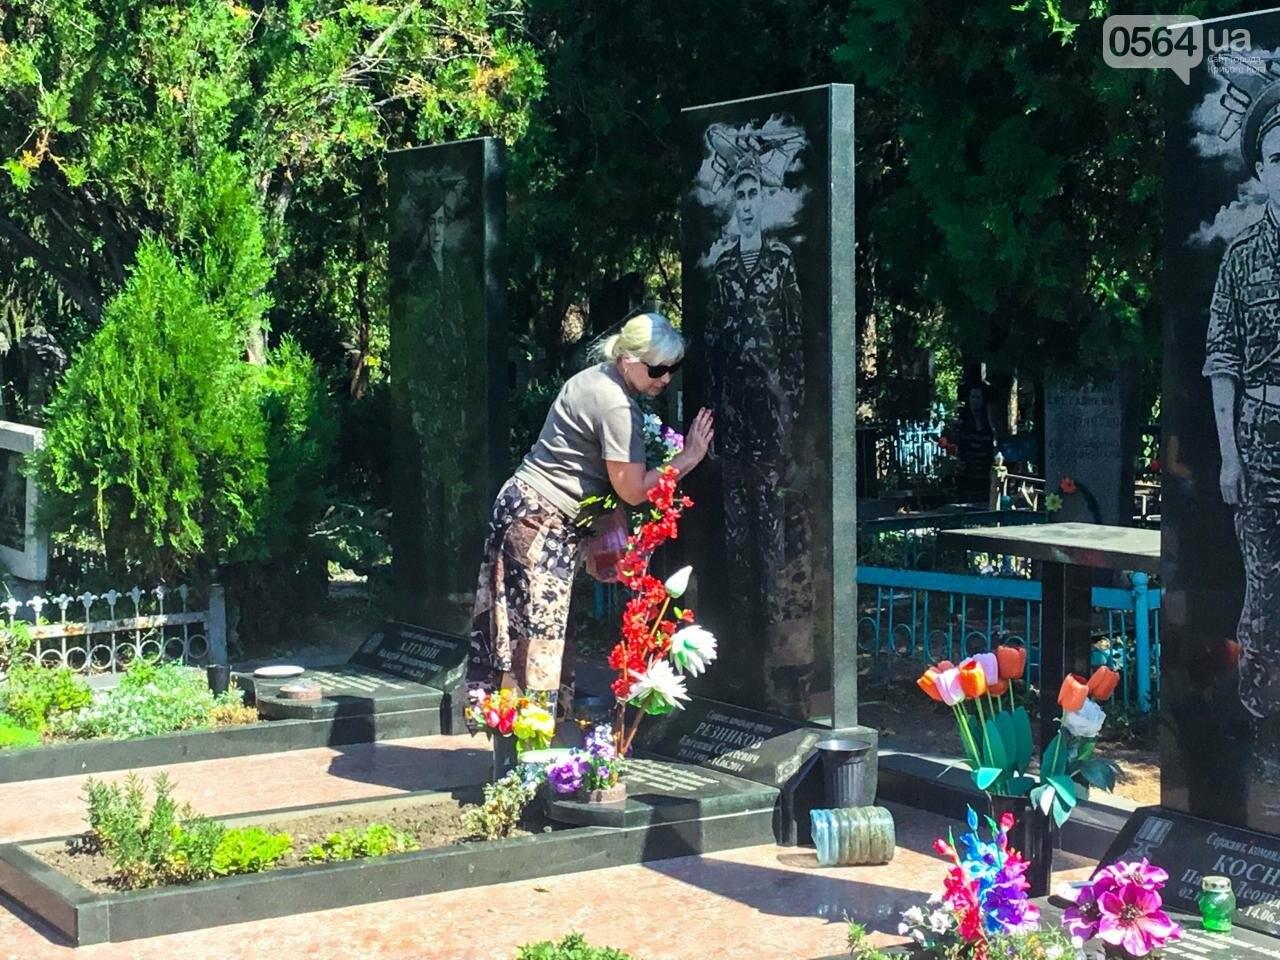 На Аллее Героев провели панихиду по погибшим в зоне АТО криворожанам, - ФОТО , фото-13